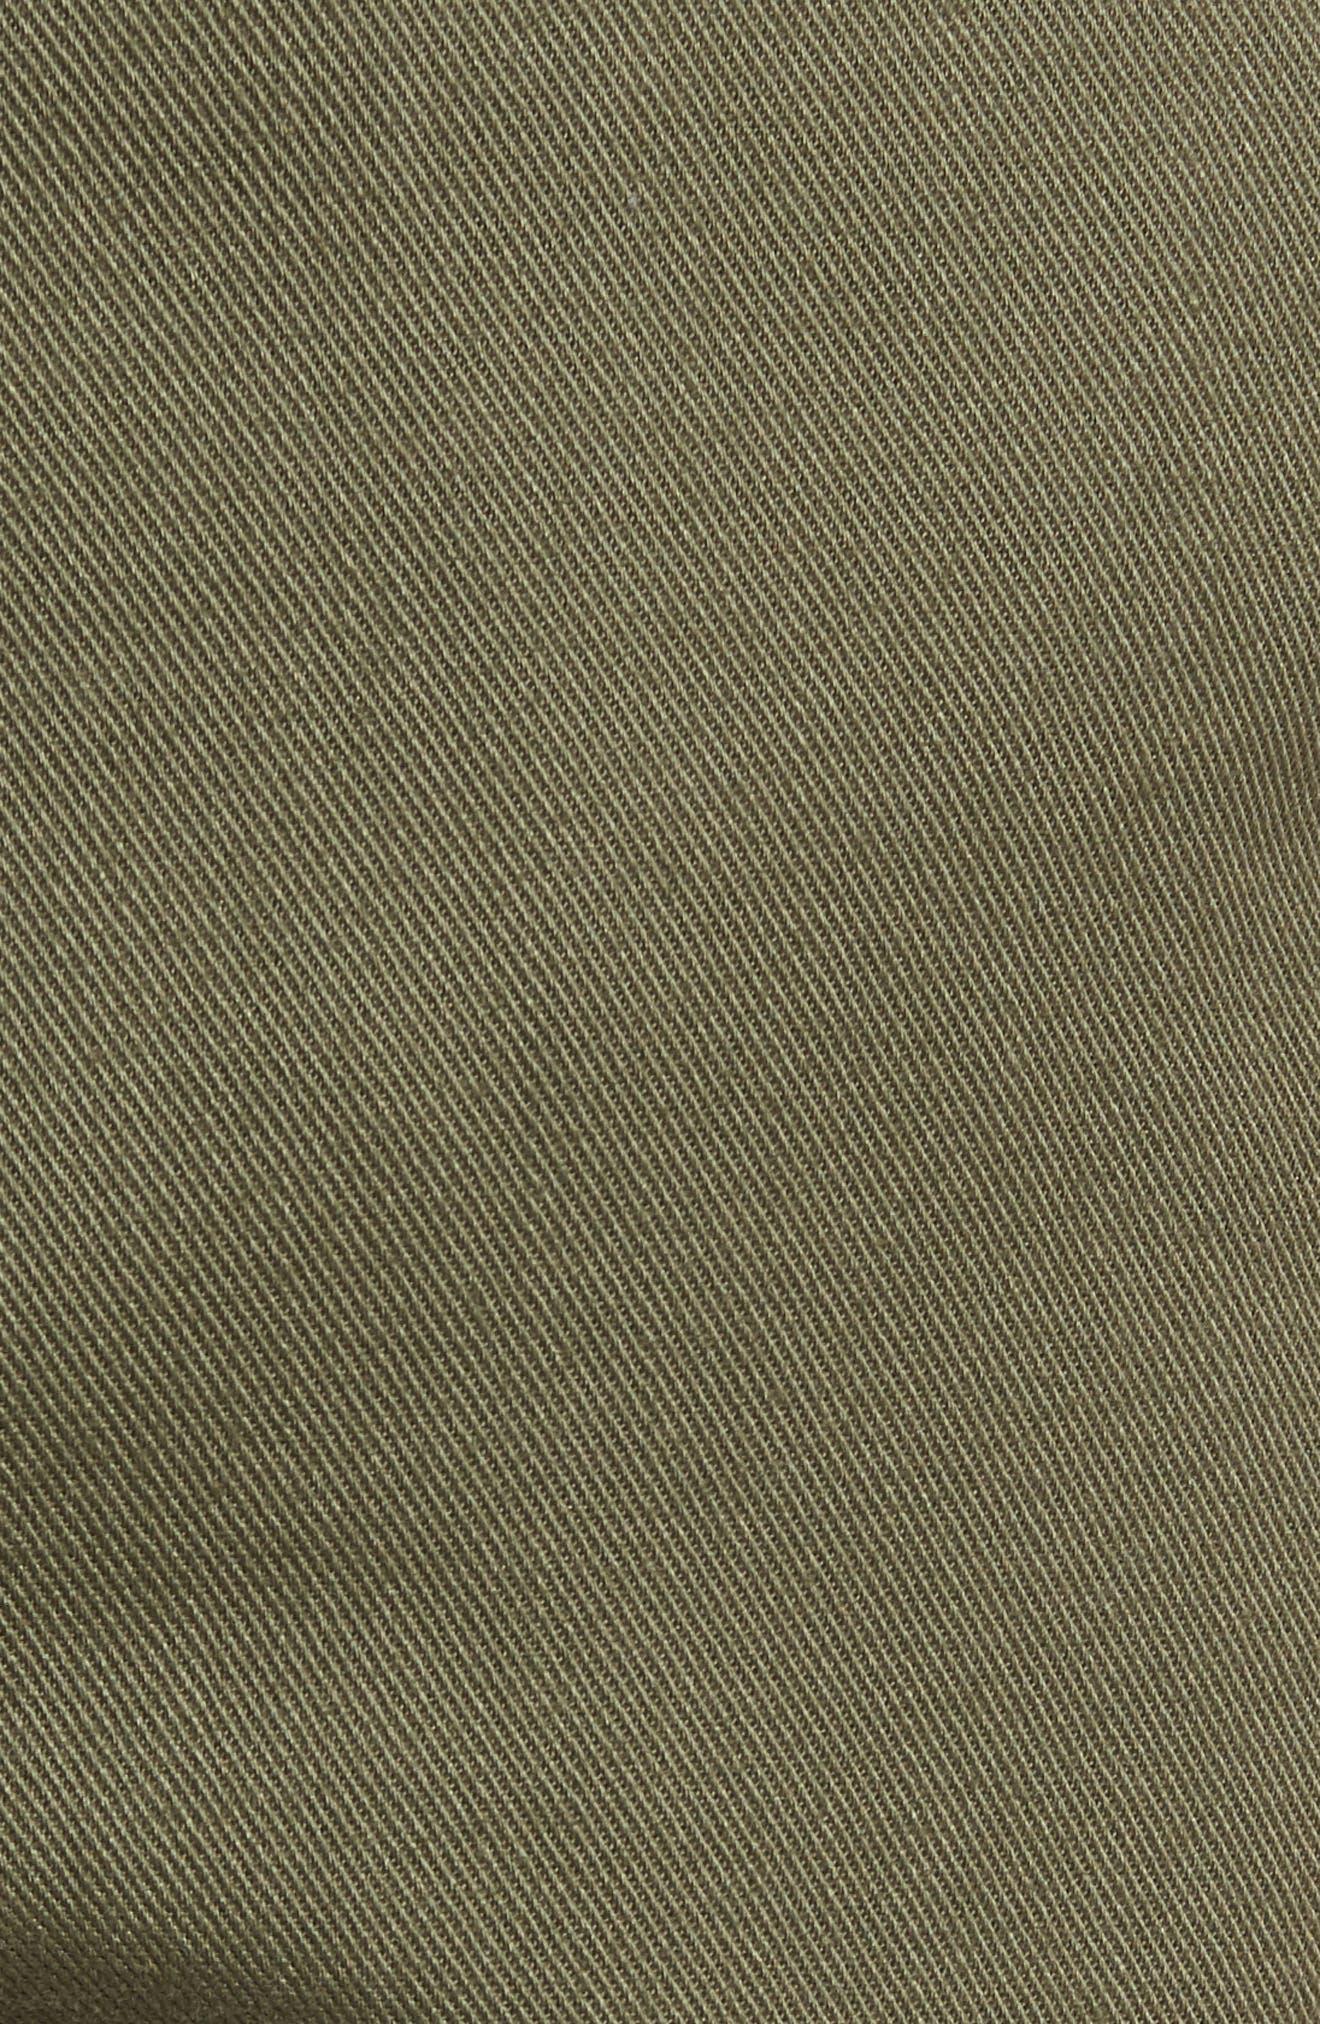 VSM Prowler Shorts,                             Alternate thumbnail 15, color,